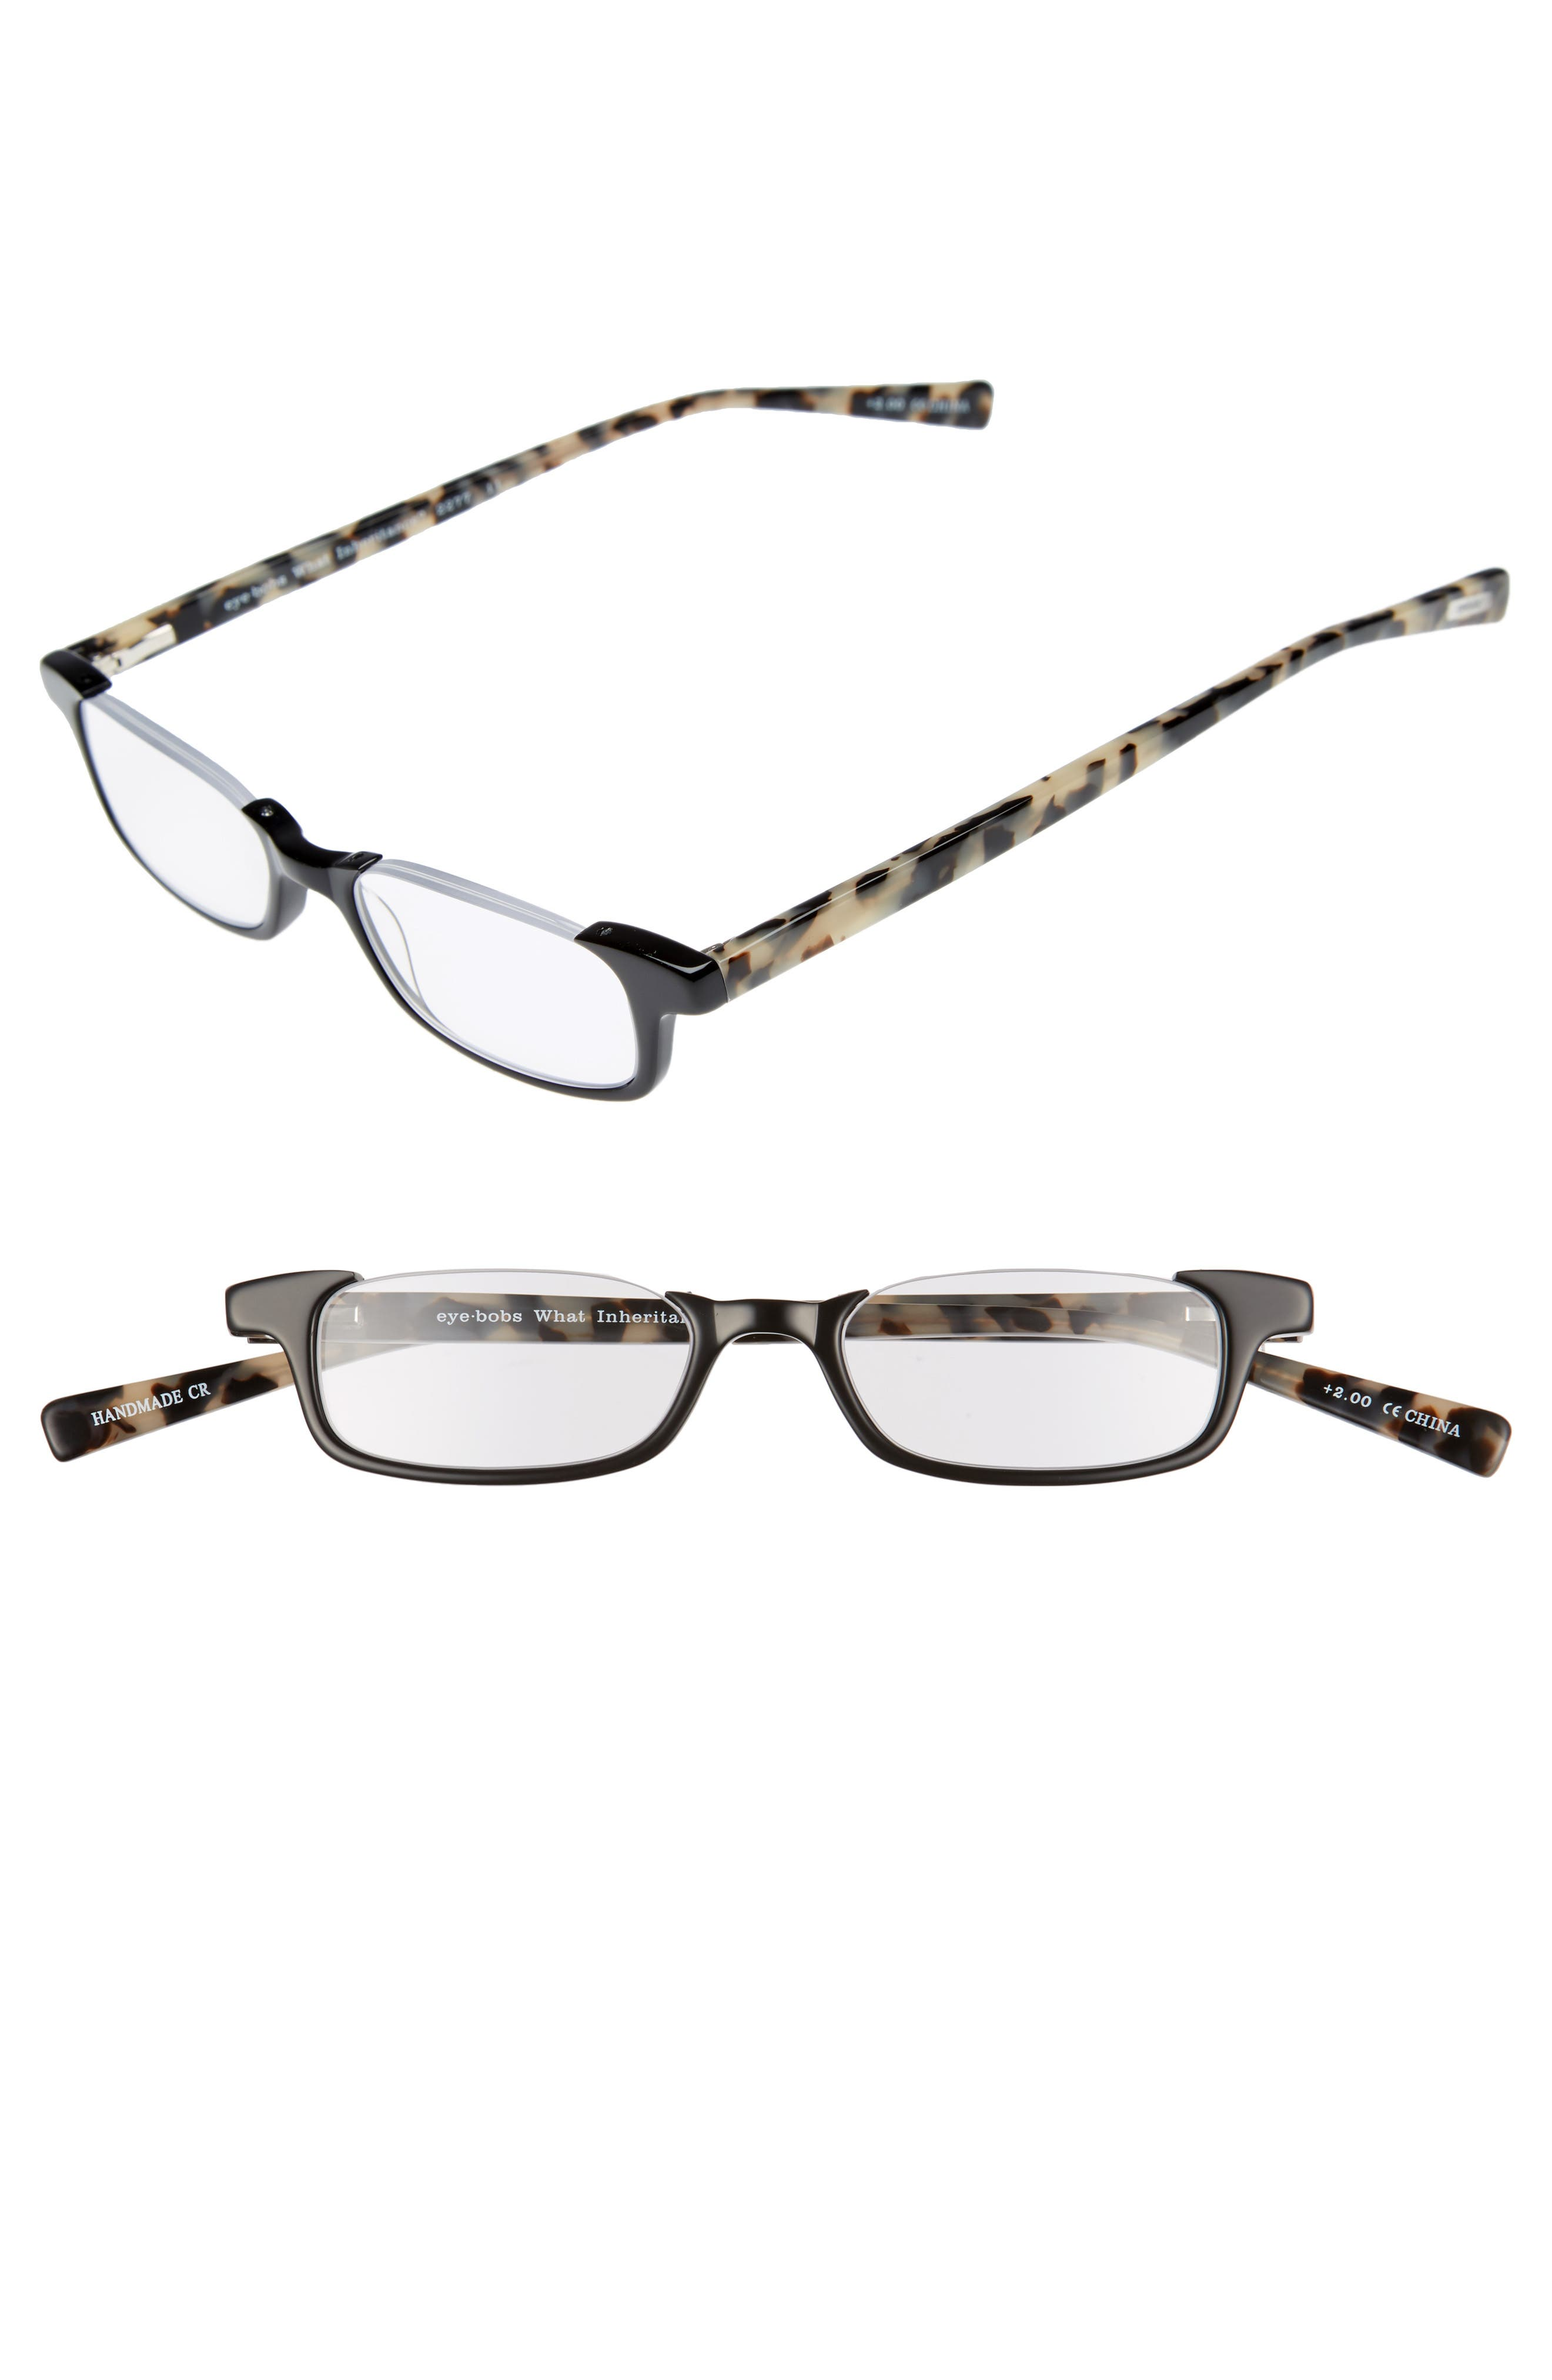 Main Image - Eyebobs What Inheritance 46mm Reading Glasses